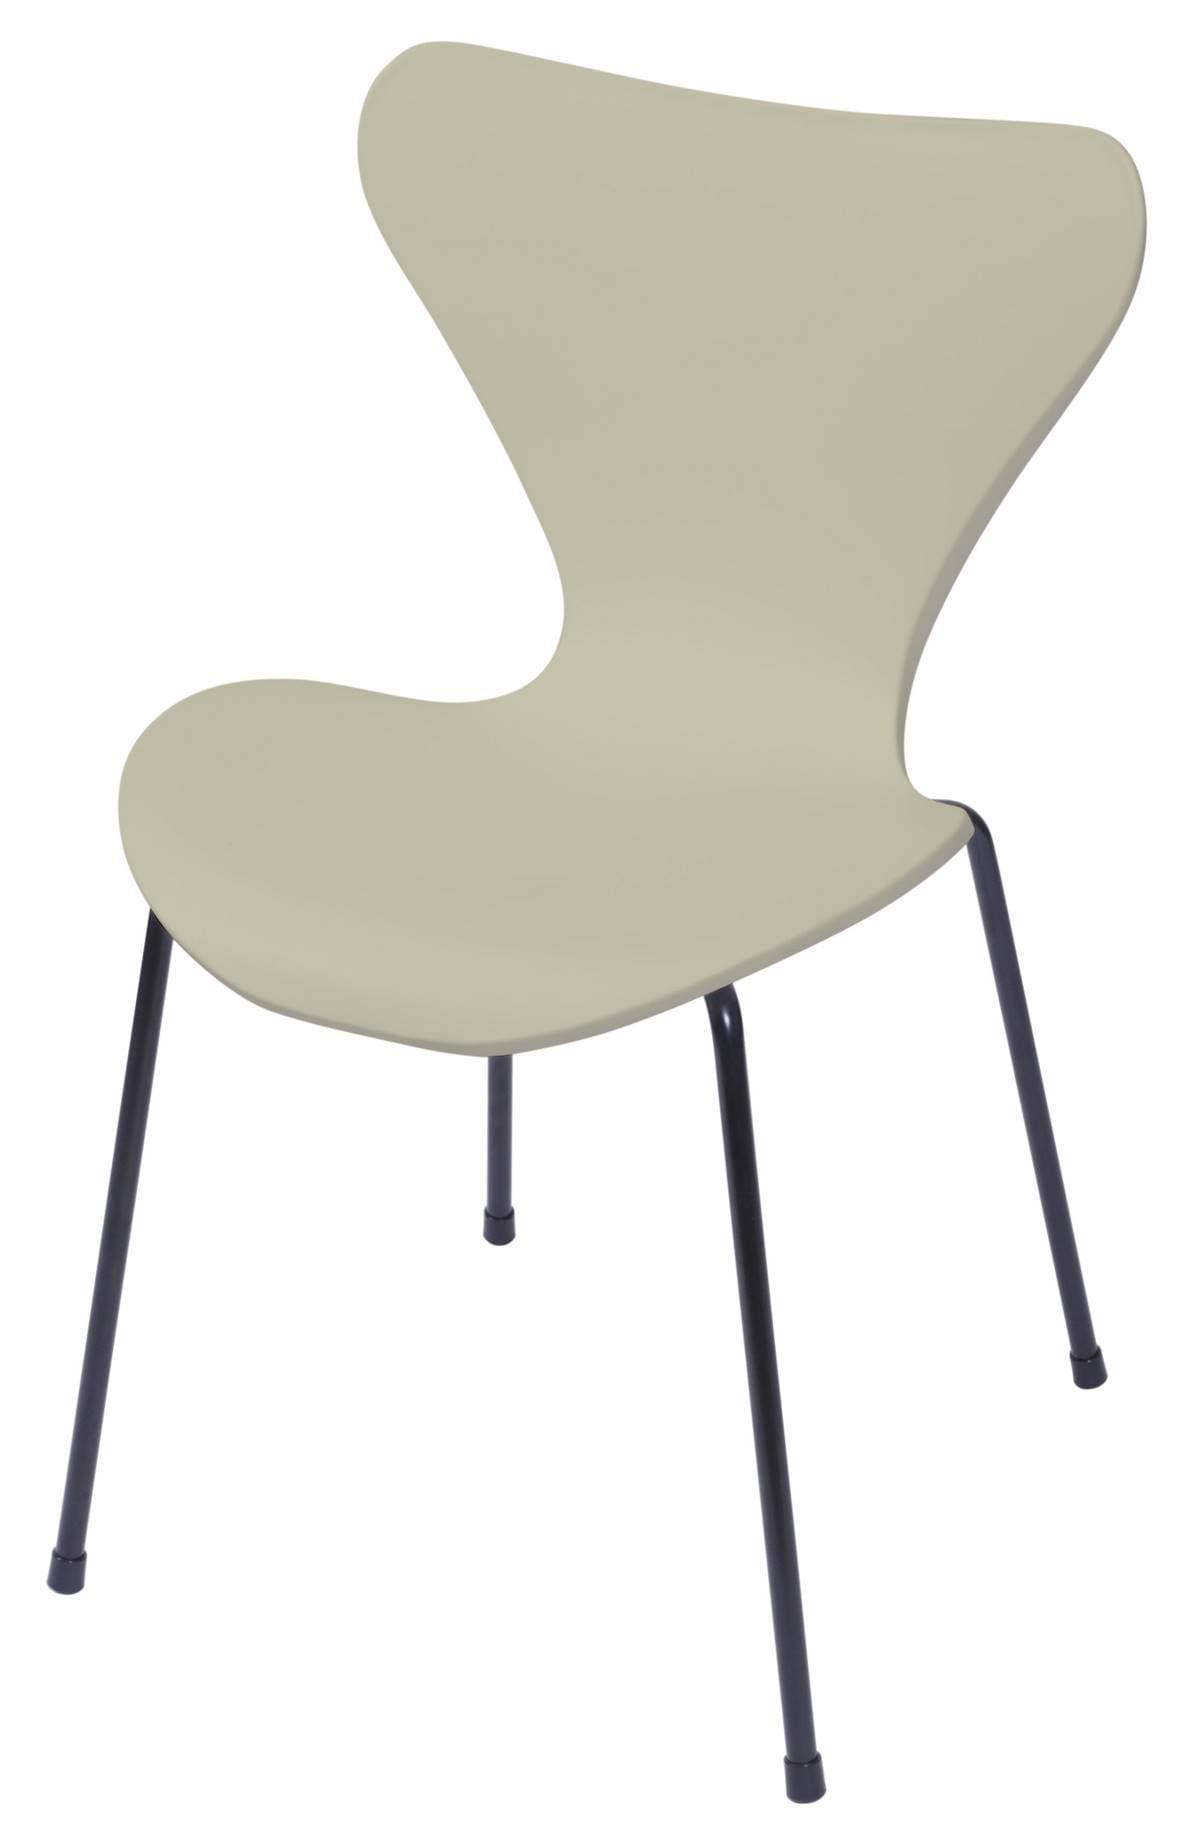 Cadeira Jacobsen Series 7 Polipropileno Fendi com Base Metal - 55943